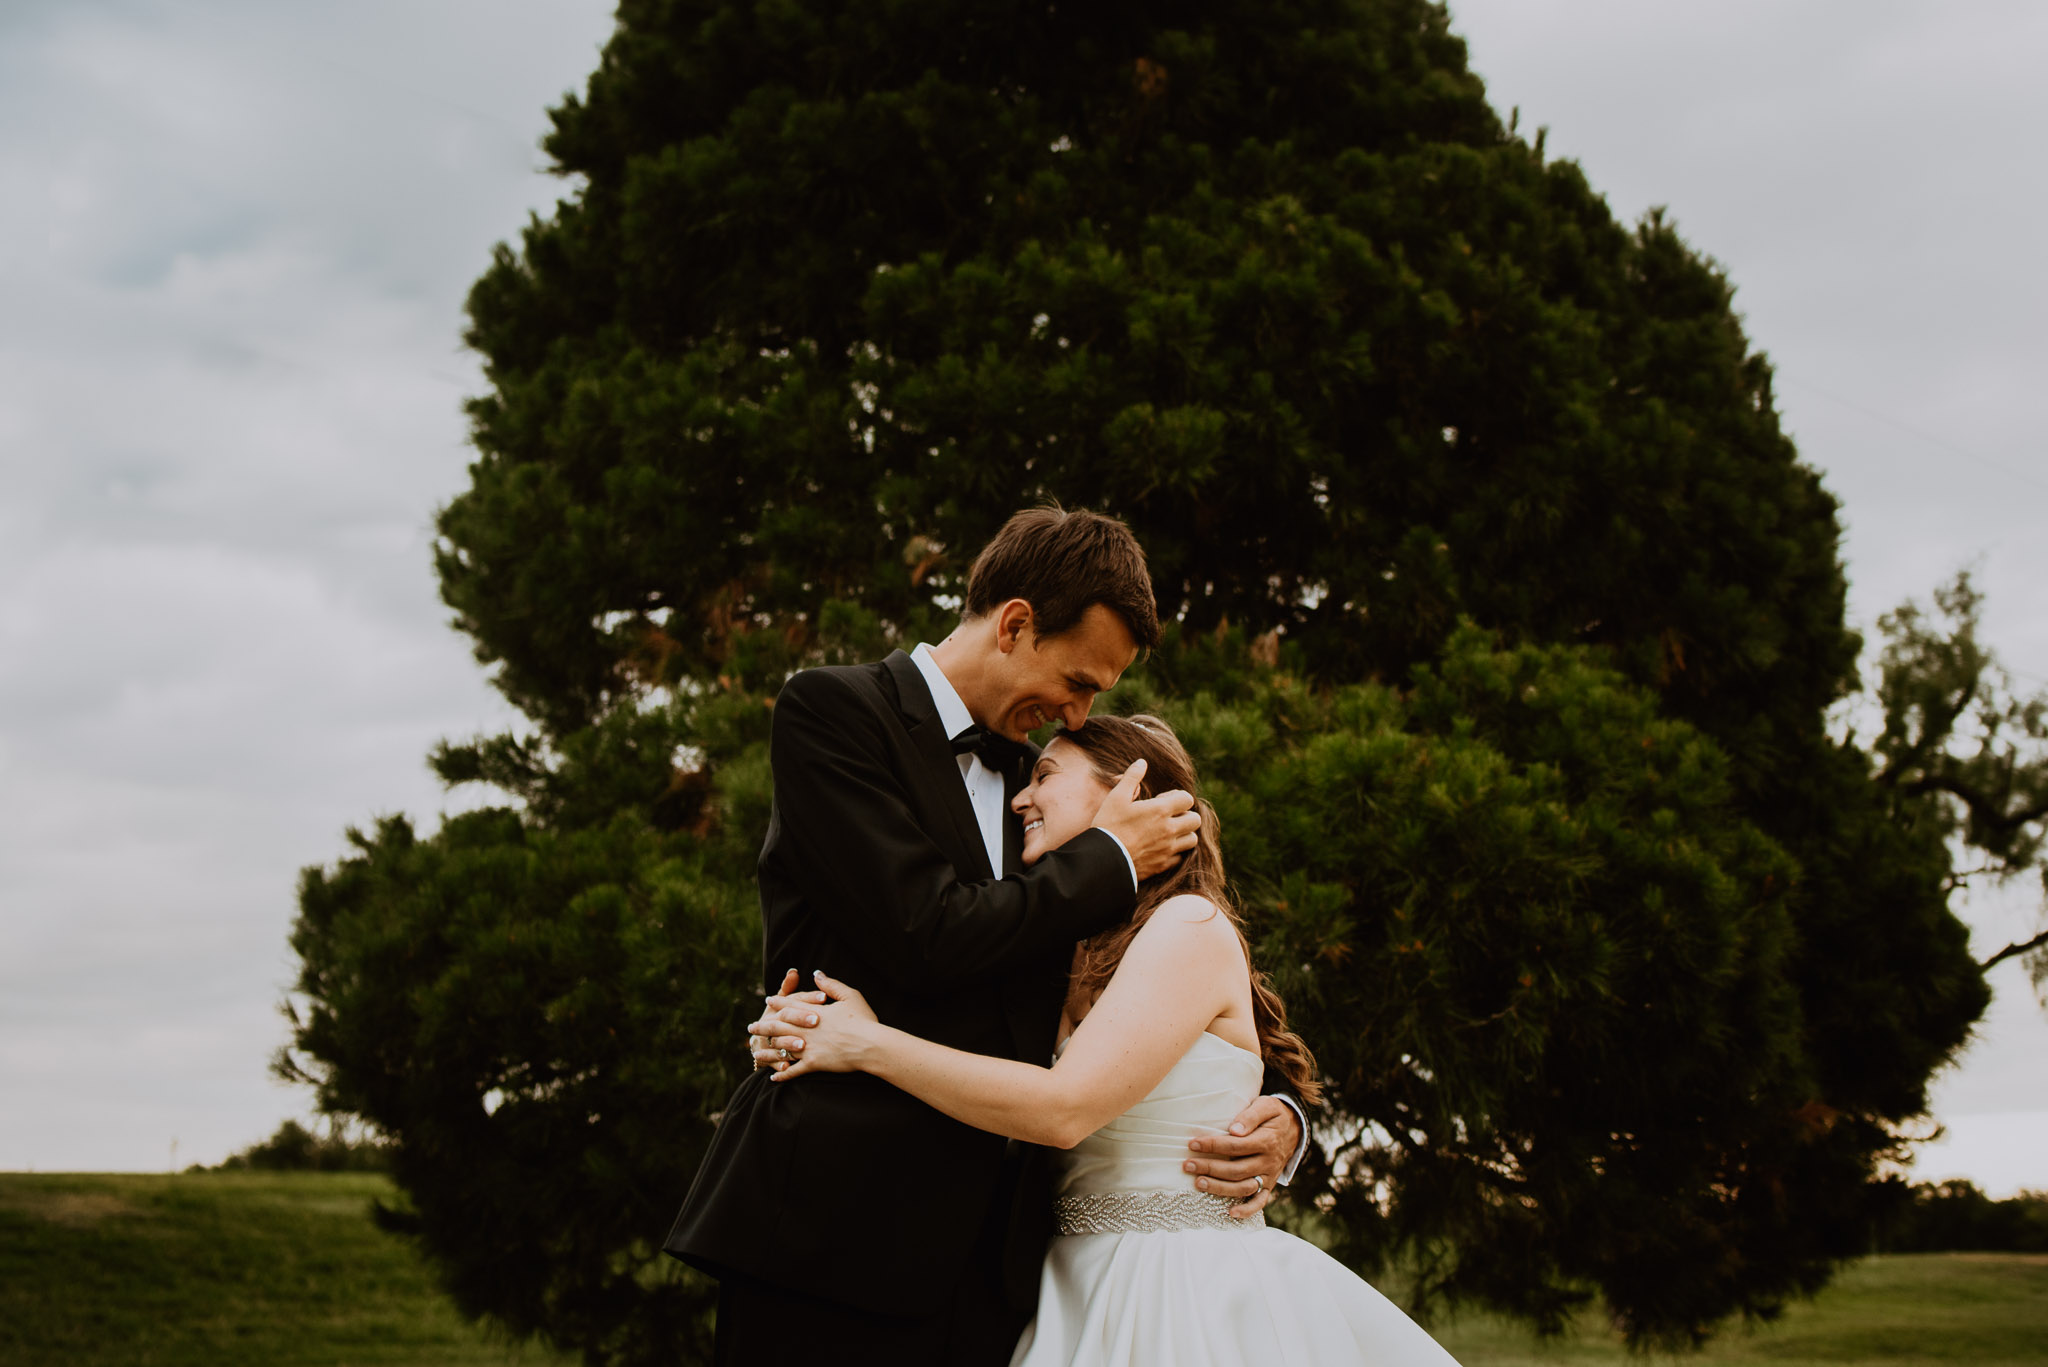 Bentwood-country-club-wedding-shea-tyson-0023.jpg